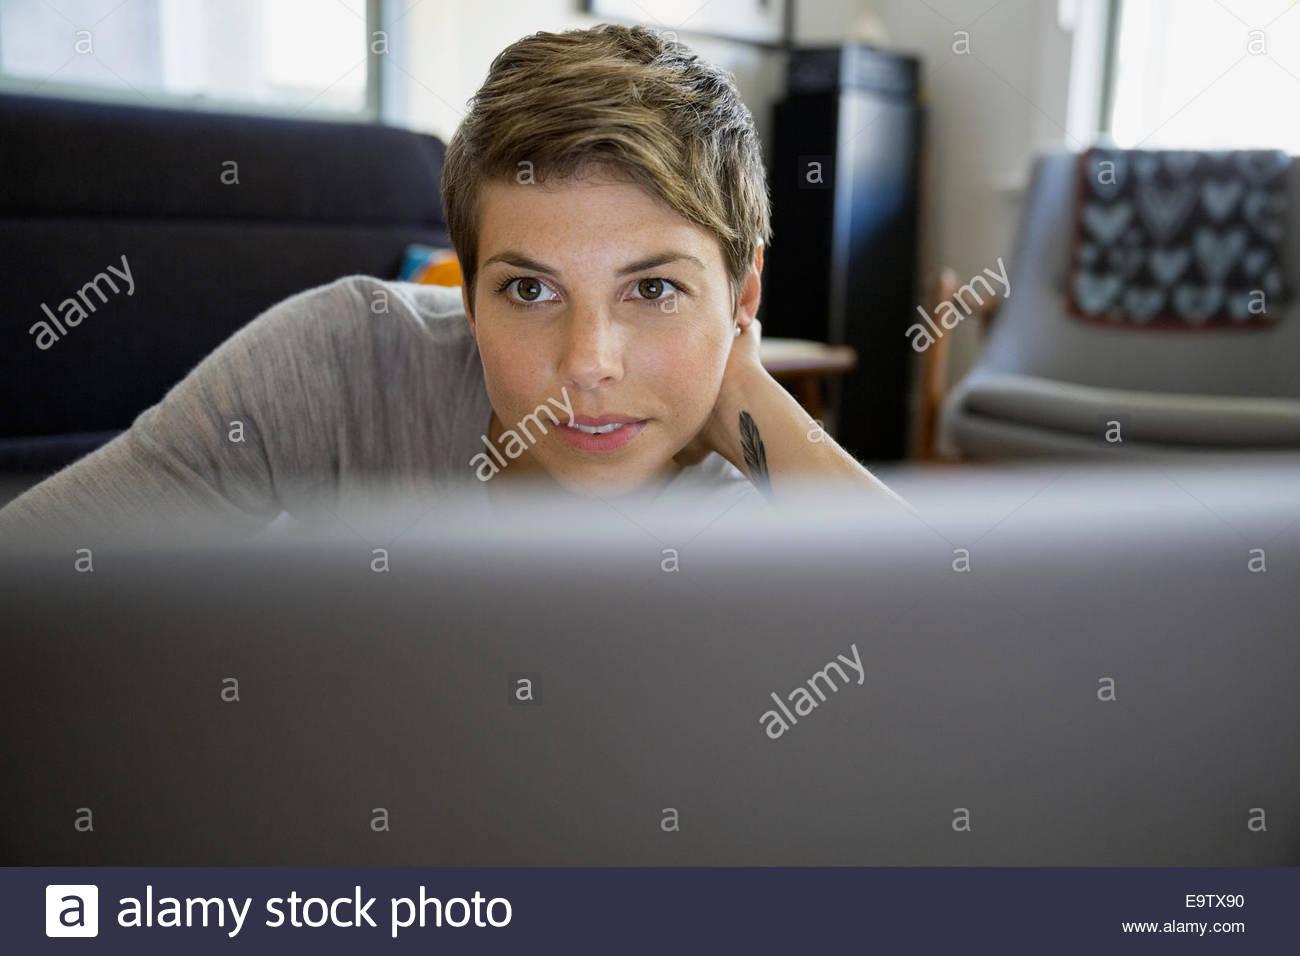 Close up of woman using laptop - Stock Image